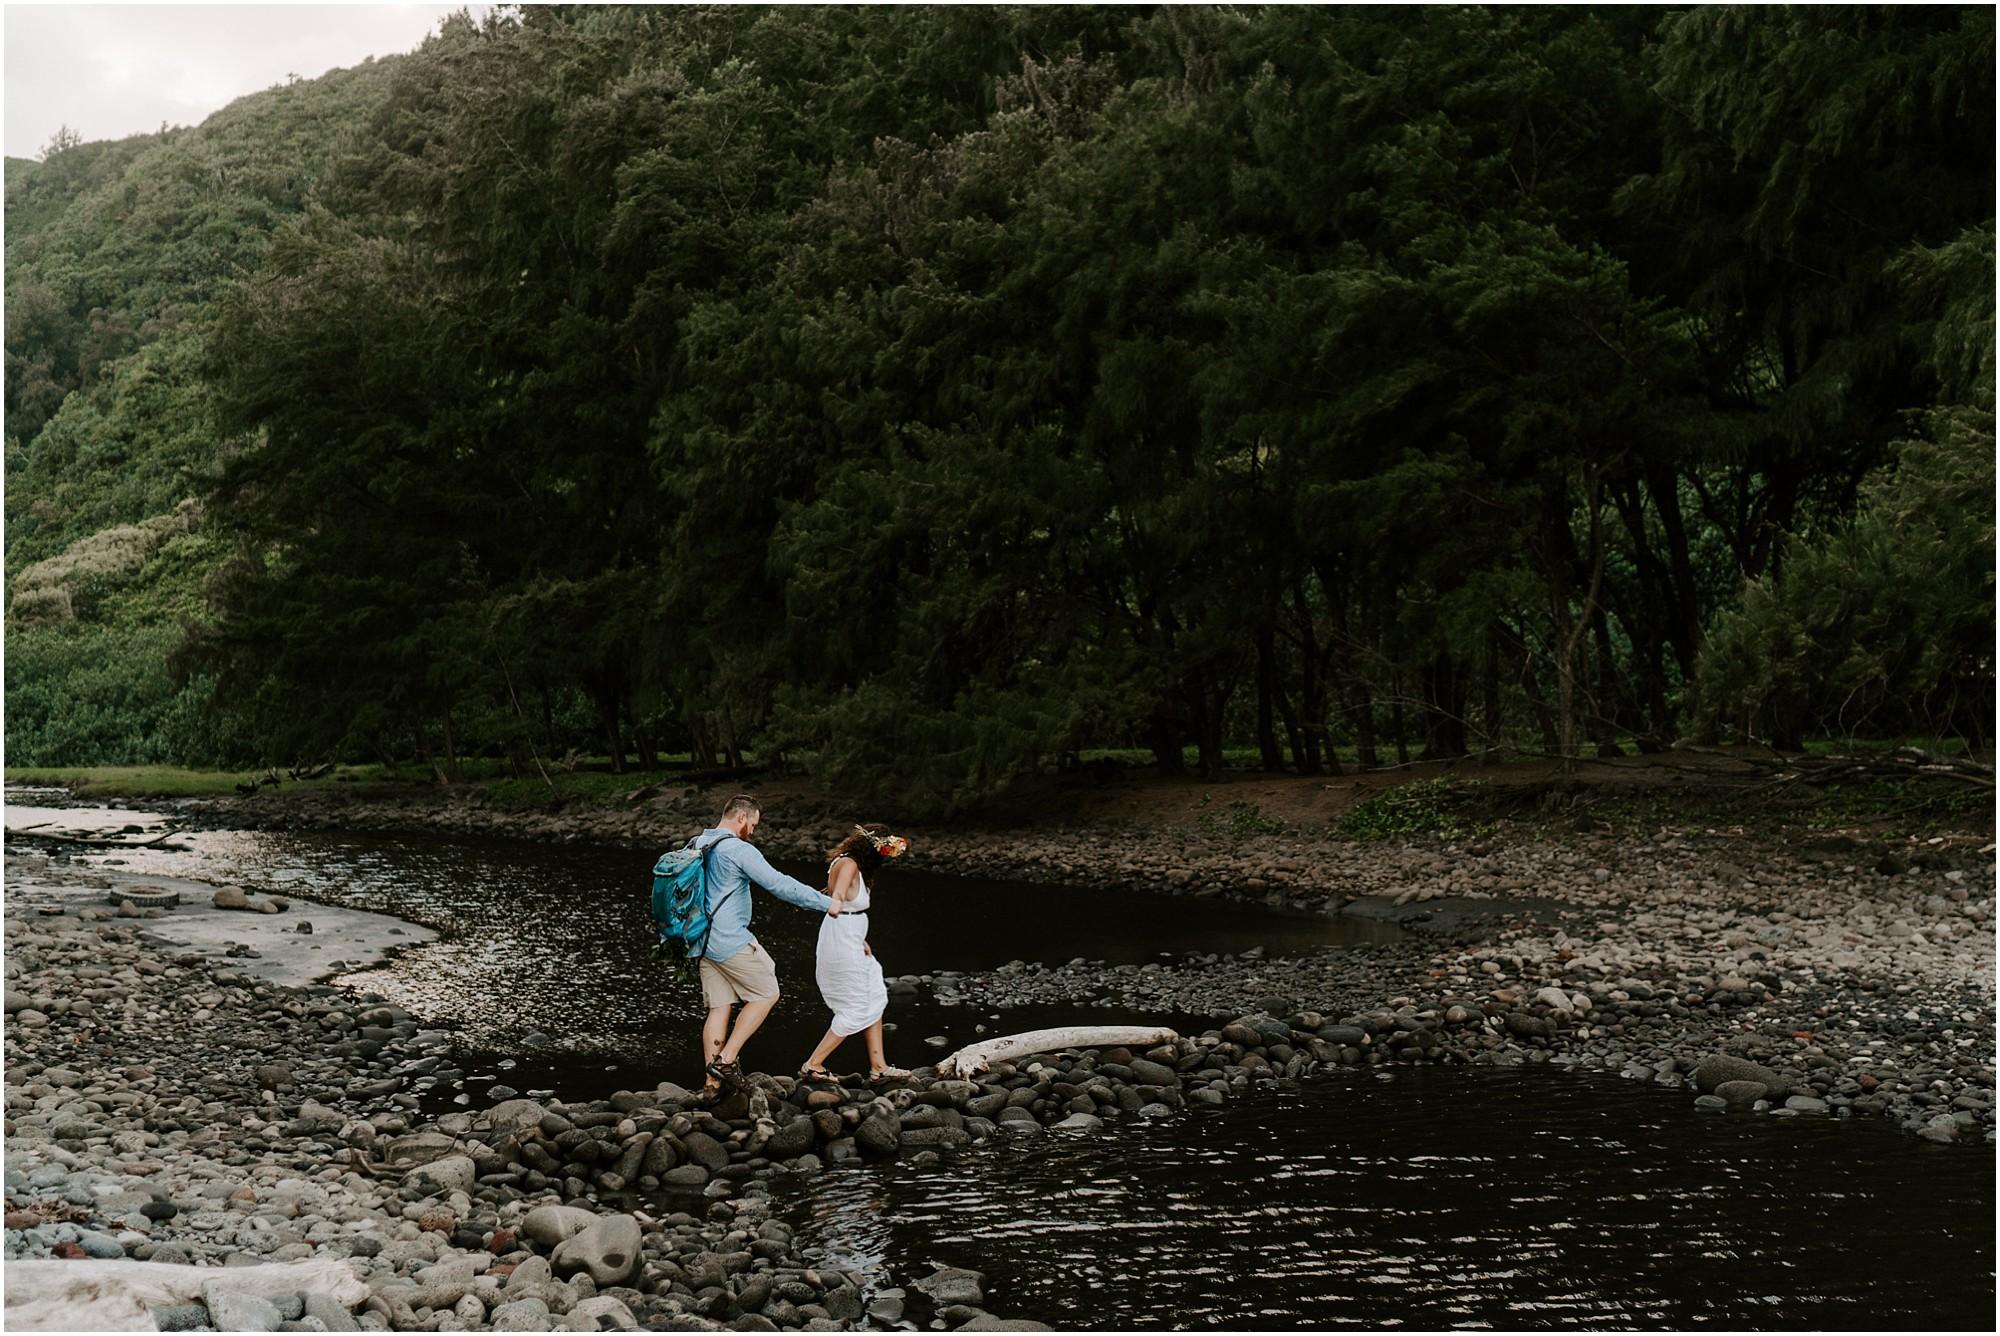 big-island-valley-proposal-hawaii-elopement-photographer_0047.jpg